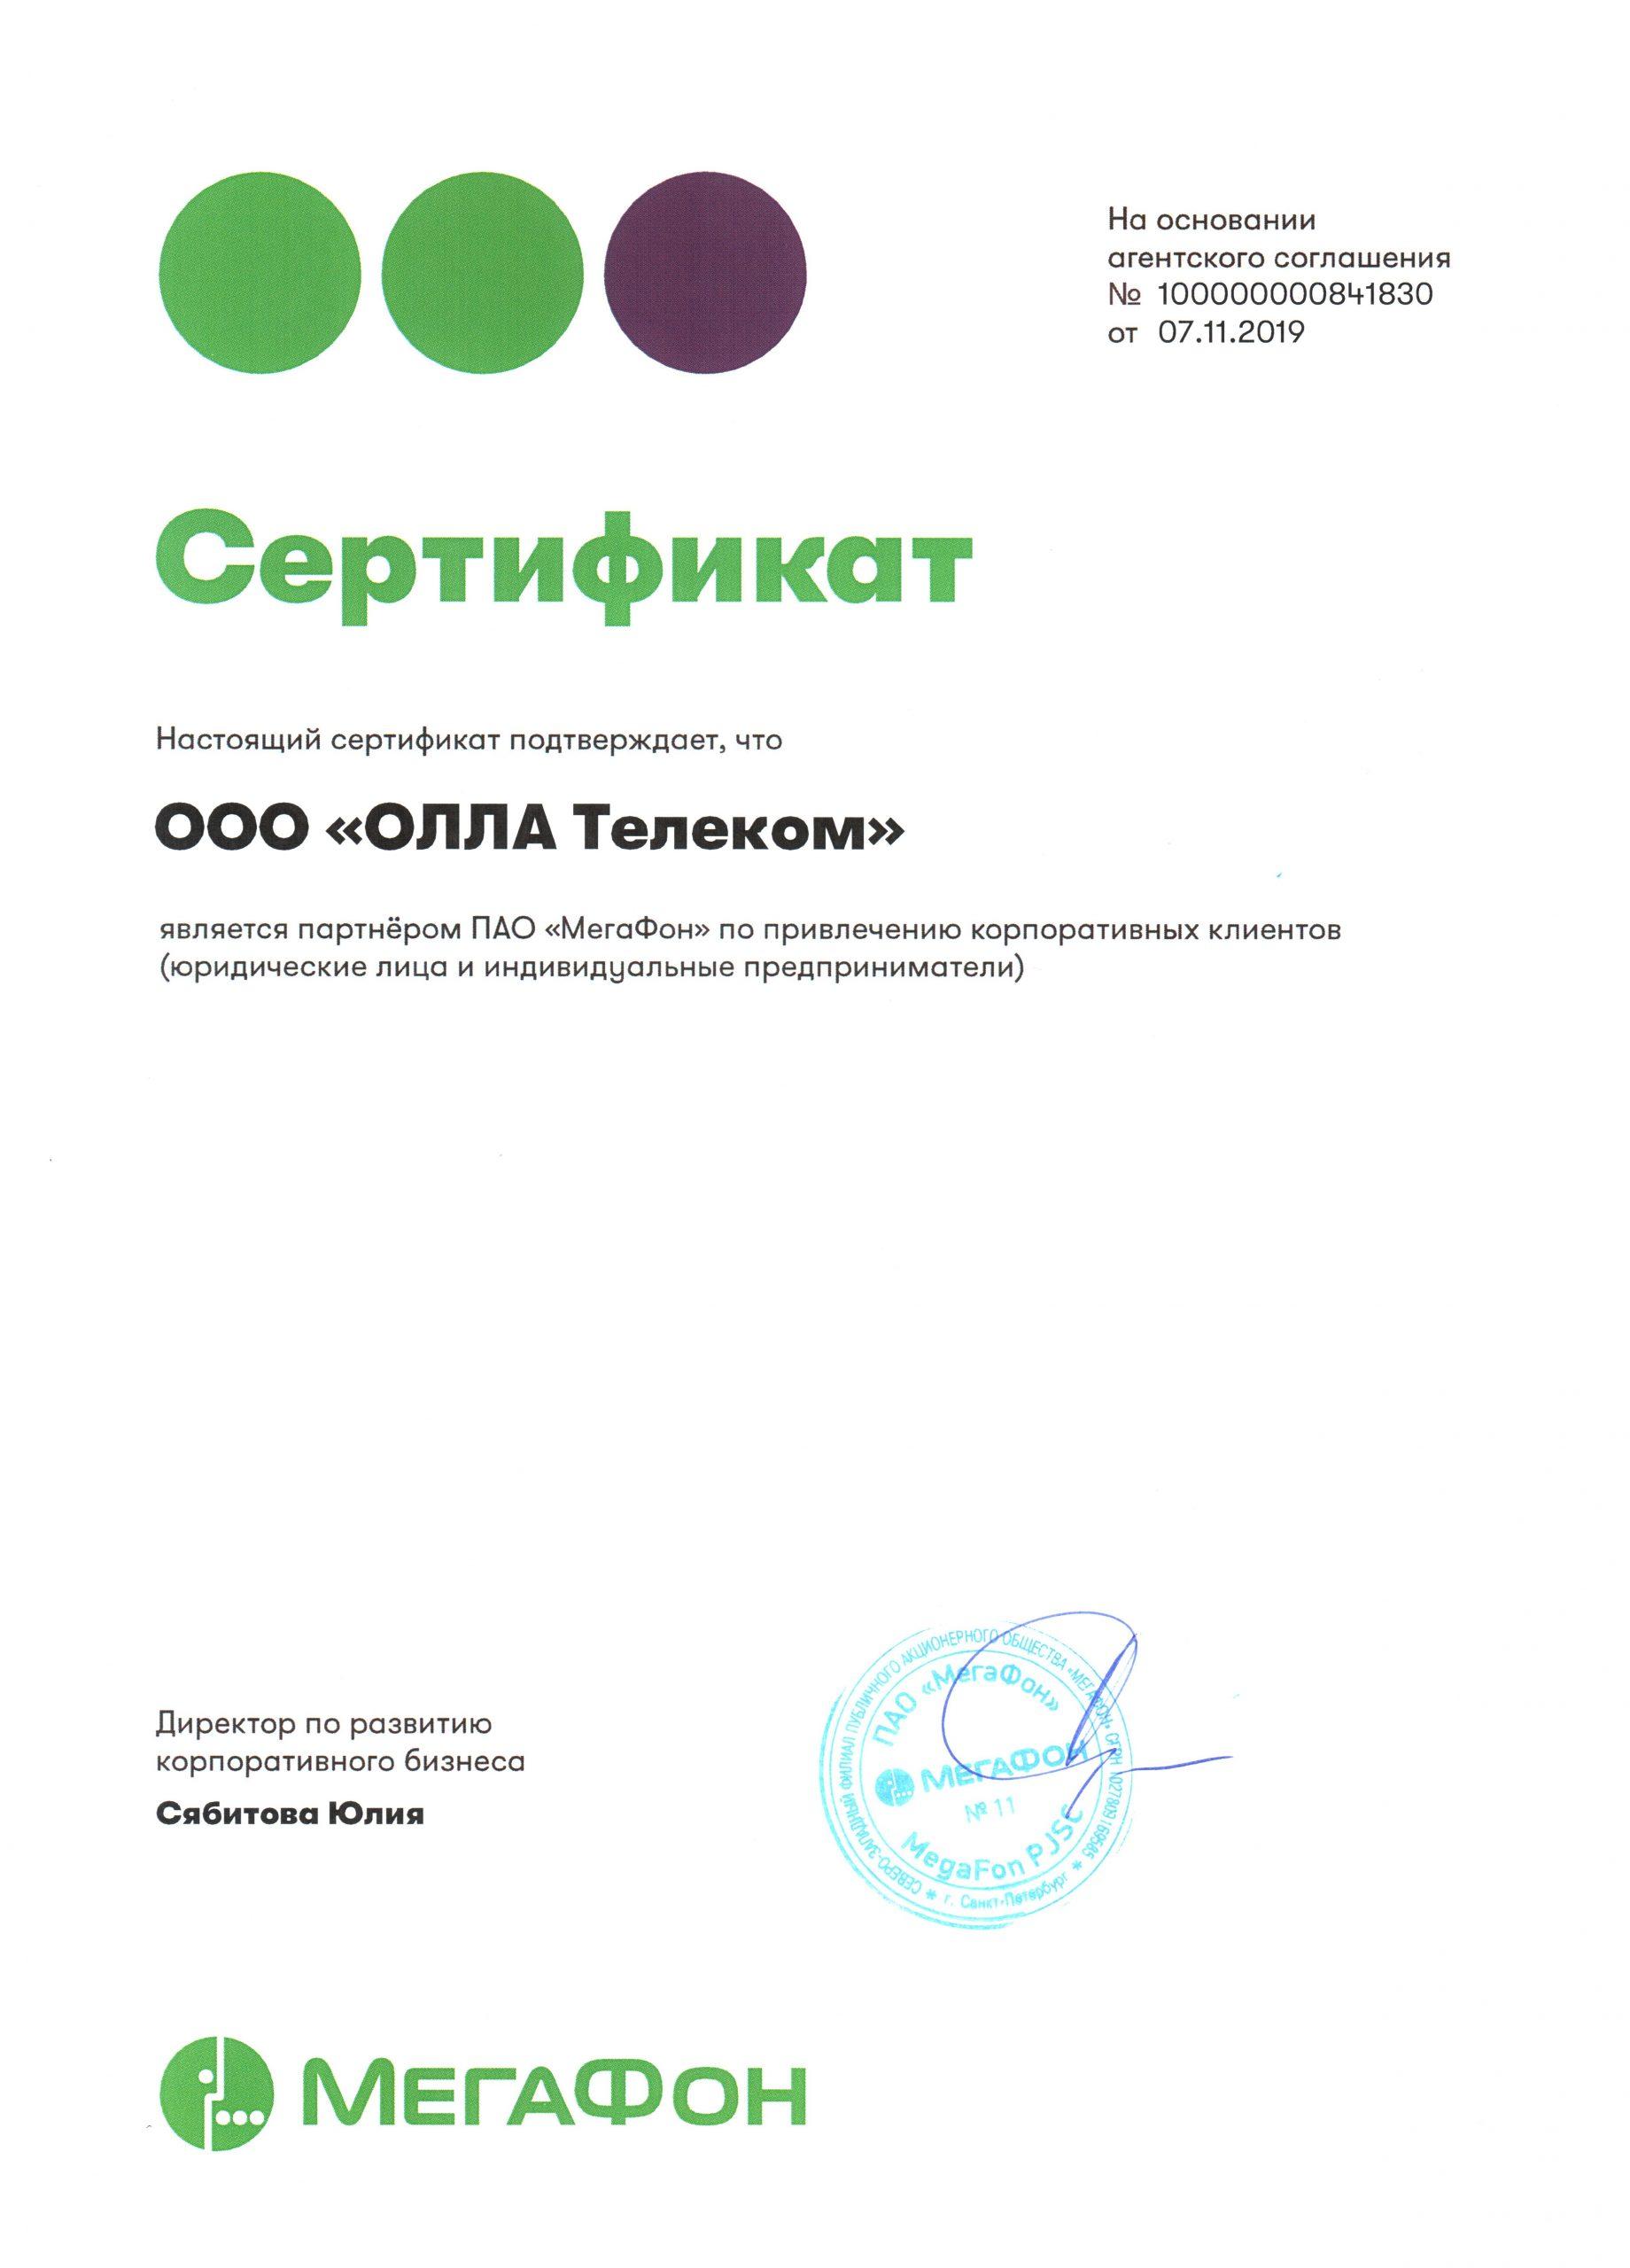 sertifikat agenta megafon